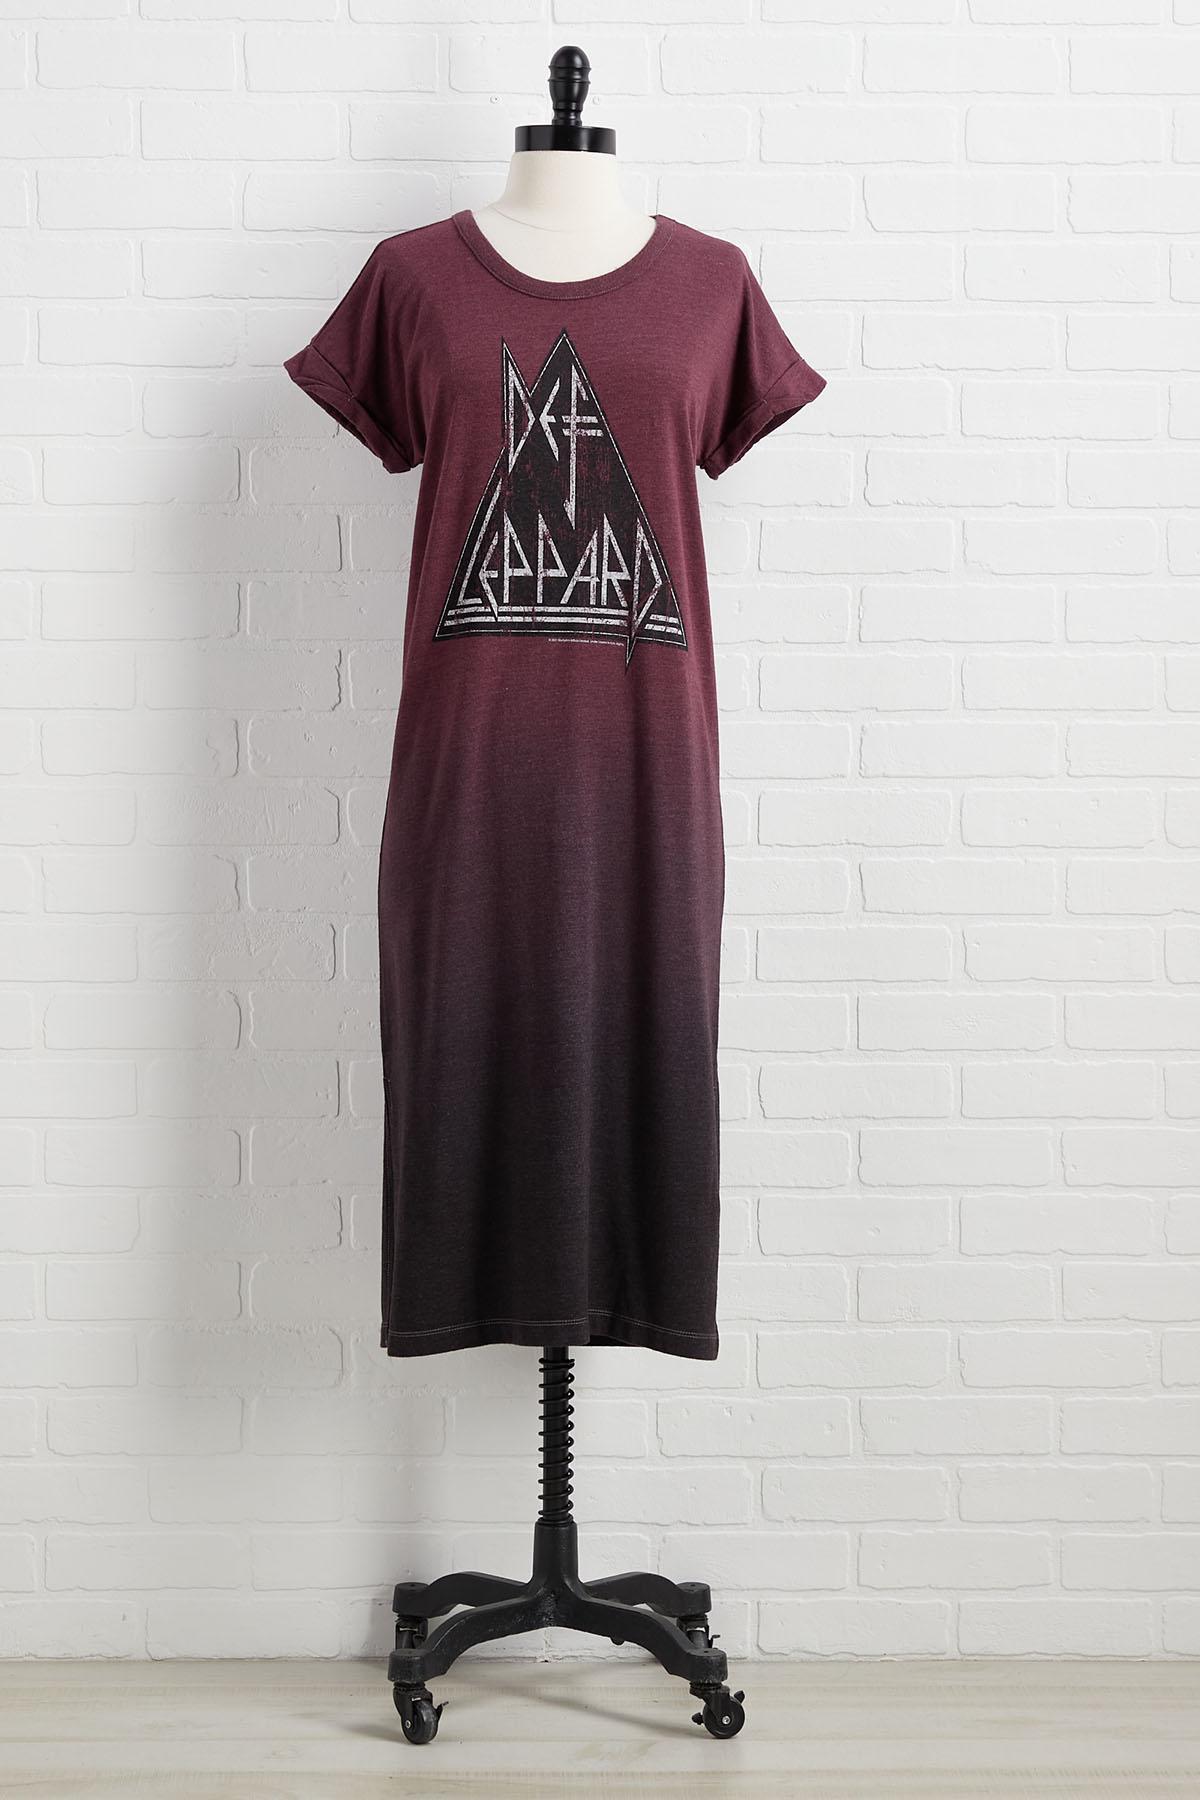 Def Leppard Tee Dress